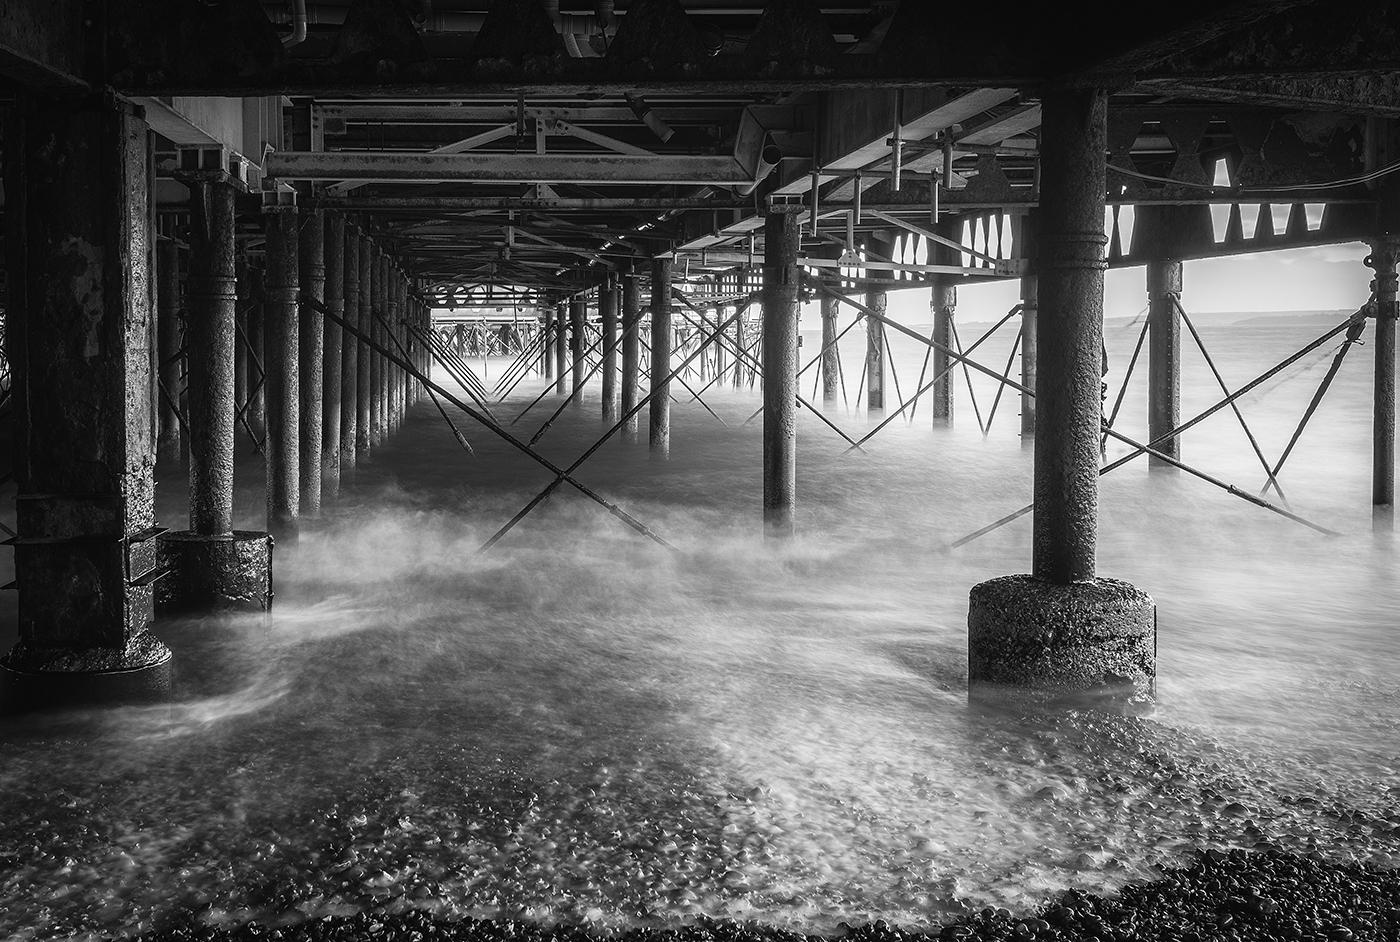 UNDER THE BOARDWALK by Paul Langford.jpg